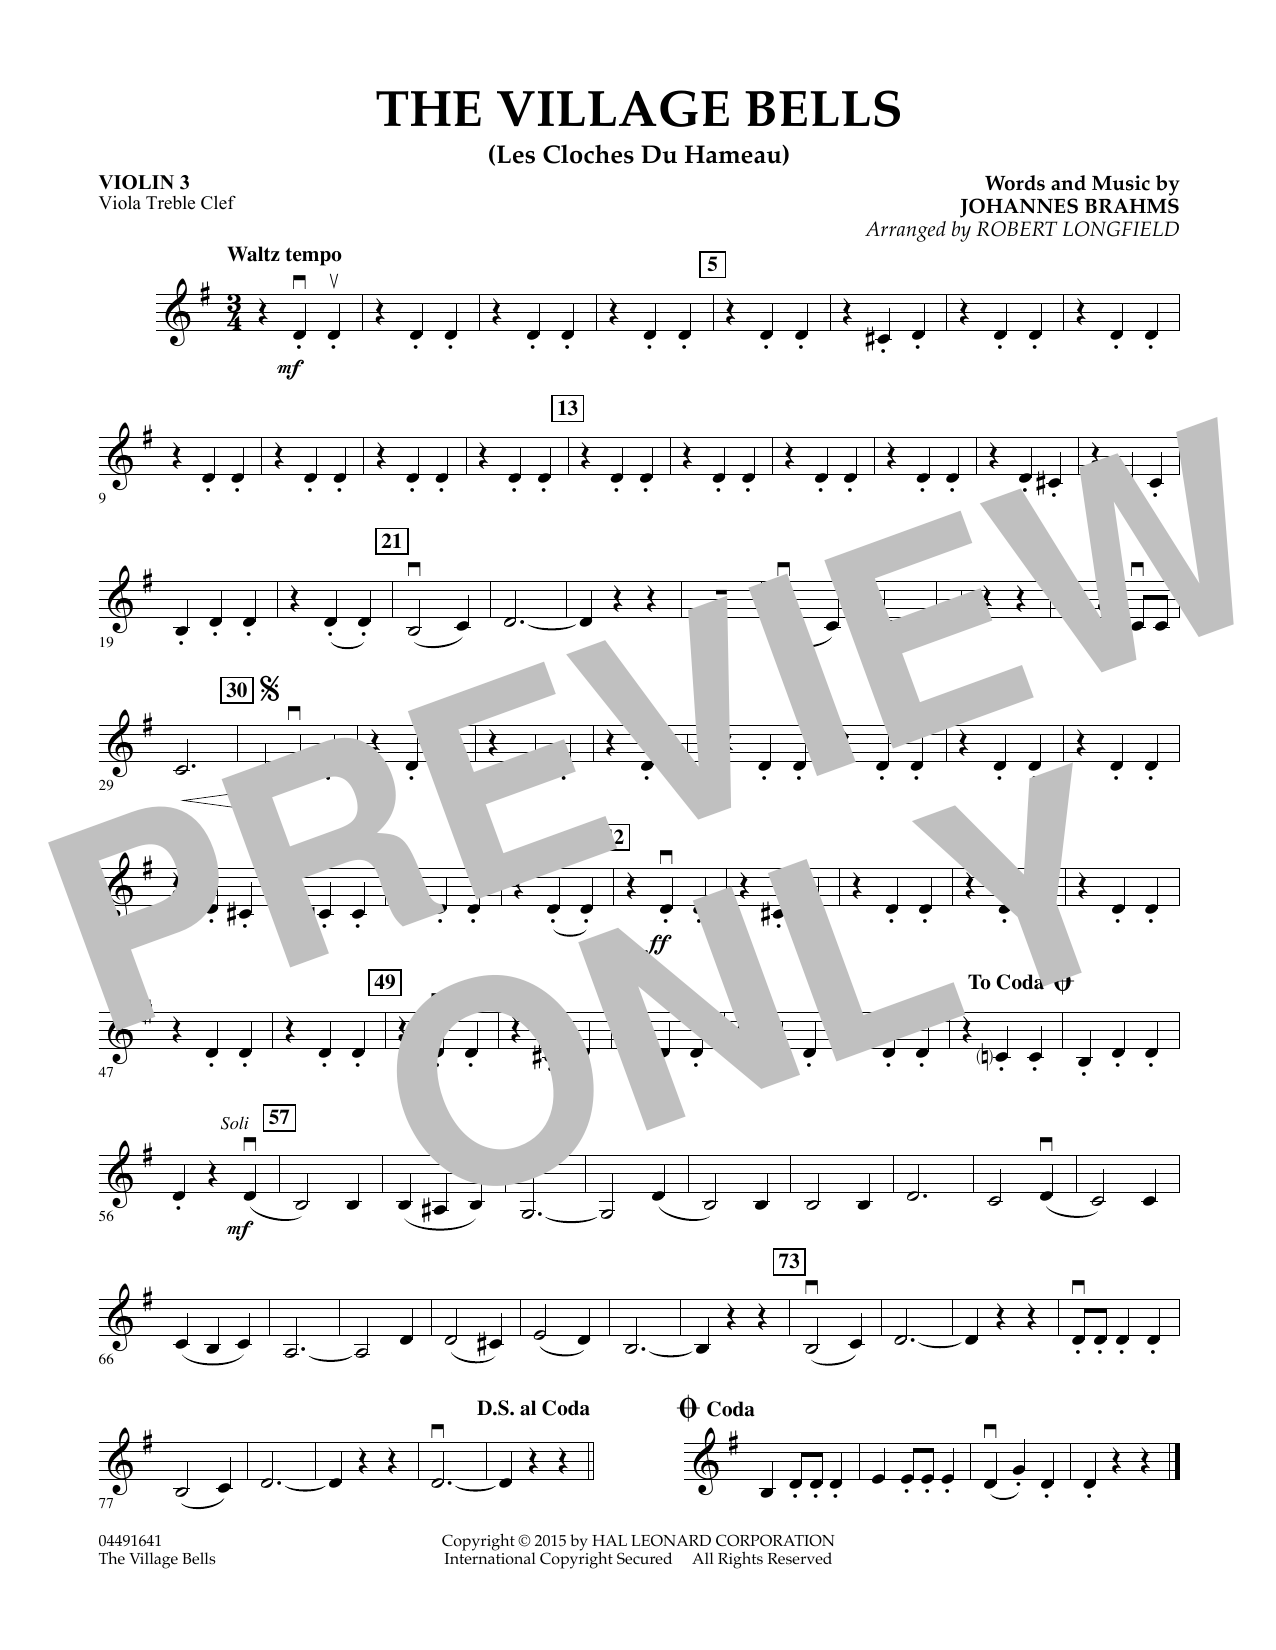 The Village Bells (Les Cloche du Hameau) - Violin 3 (Viola Treble Clef) (Orchestra)